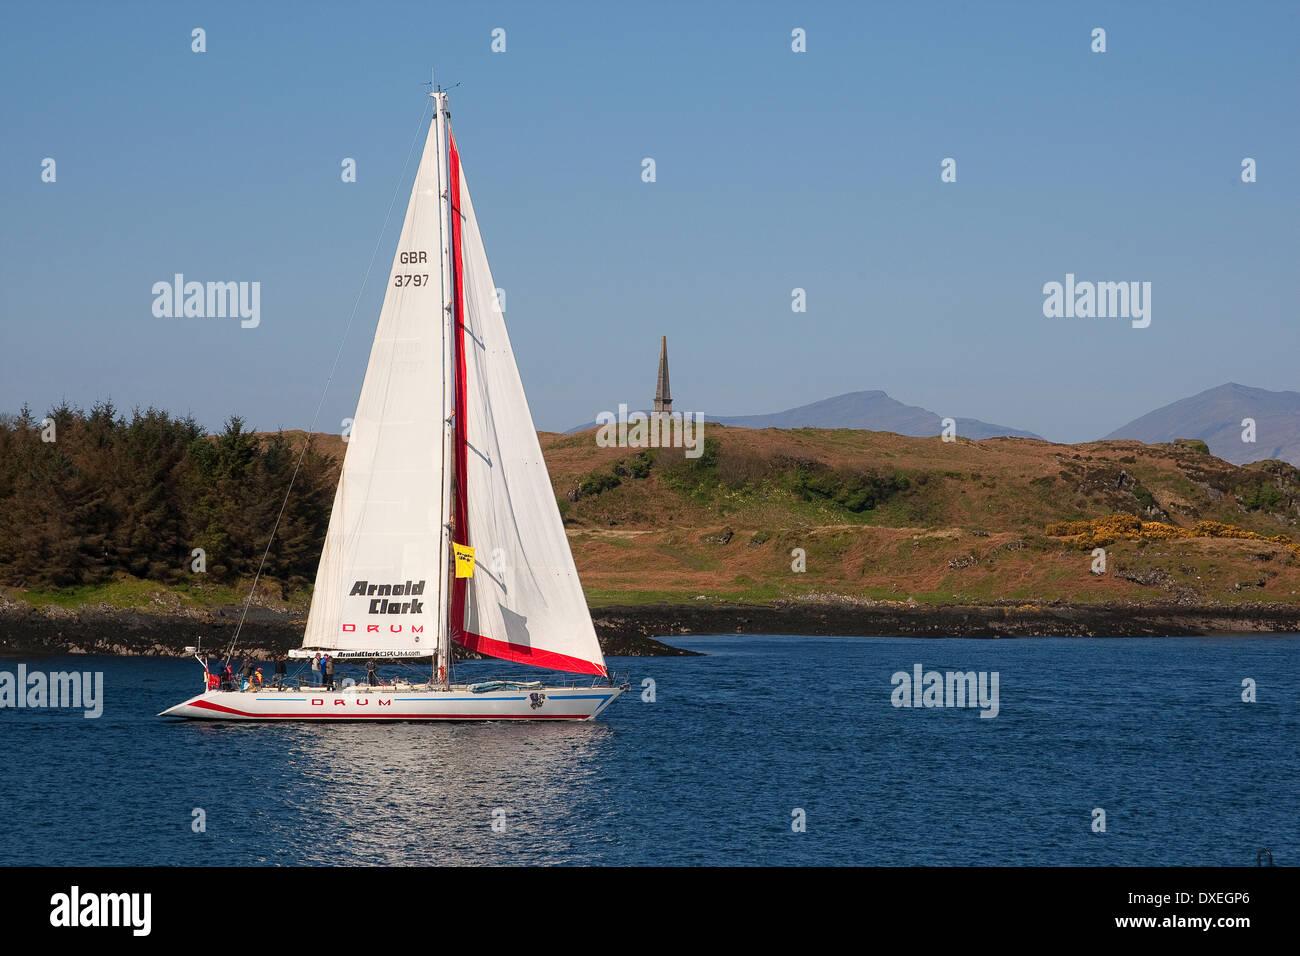 Large yacht passing Kerrera, Oban bay, Argyll - Stock Image